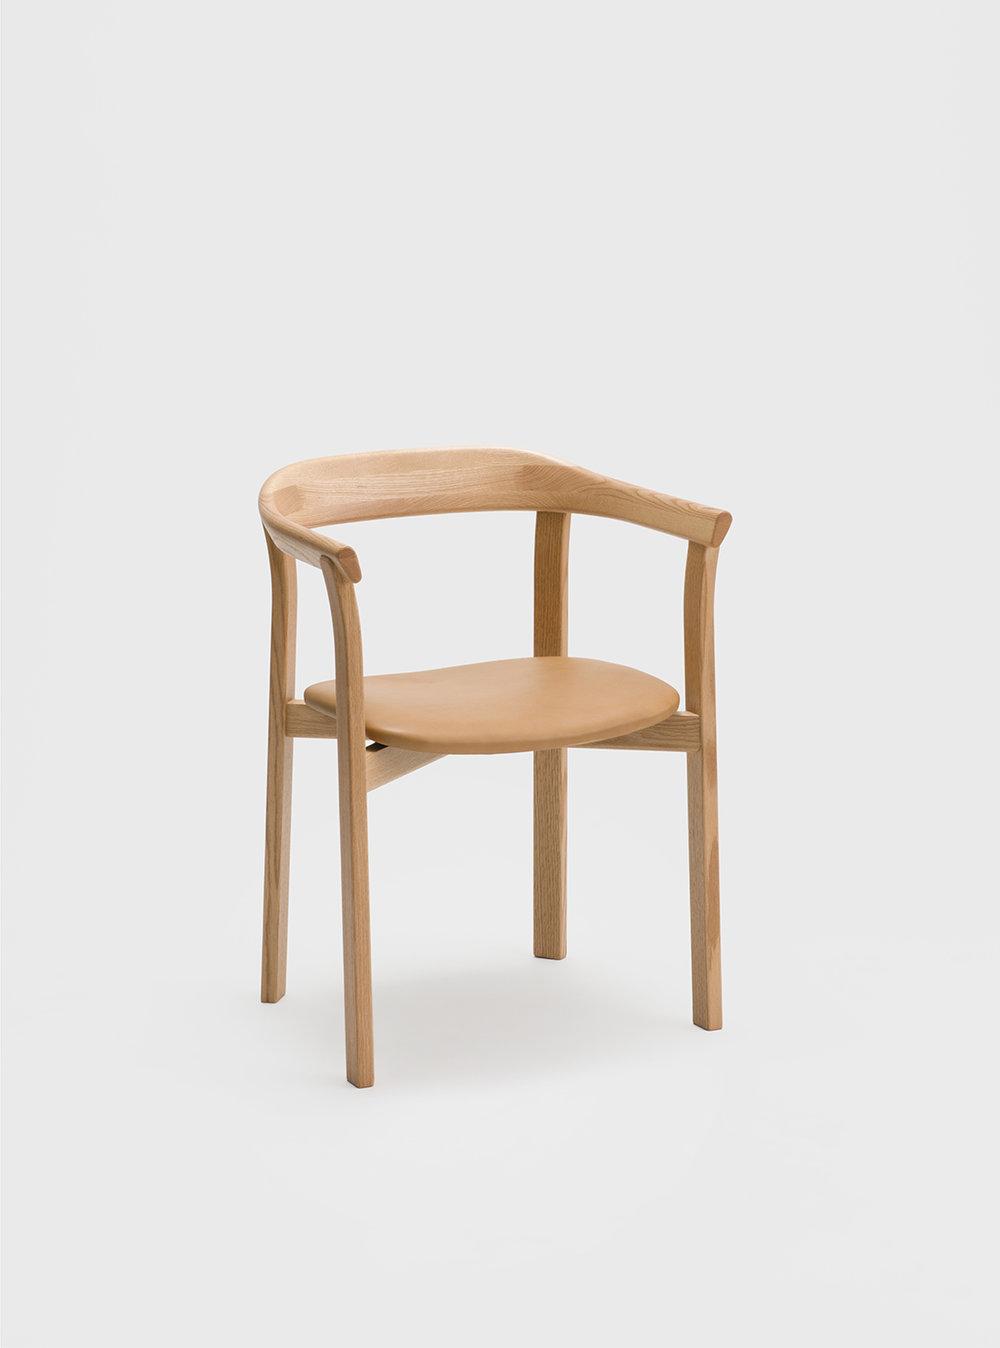 Ariake Holm Chair - Oak/Leather Seat